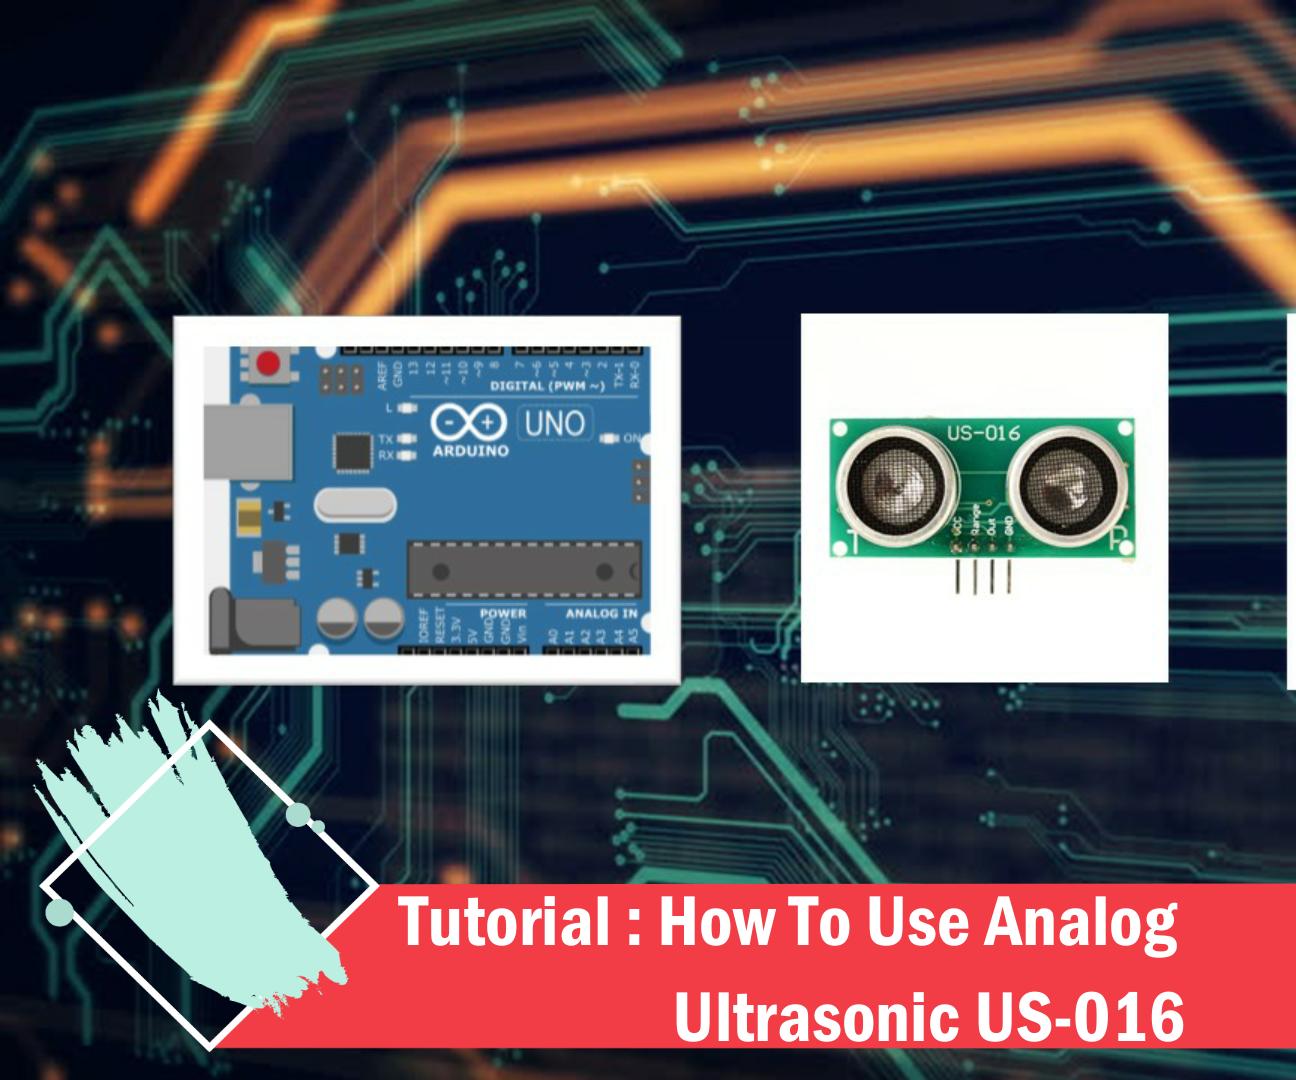 Tutorial : How to Use Analoge Ultrasonic US-016